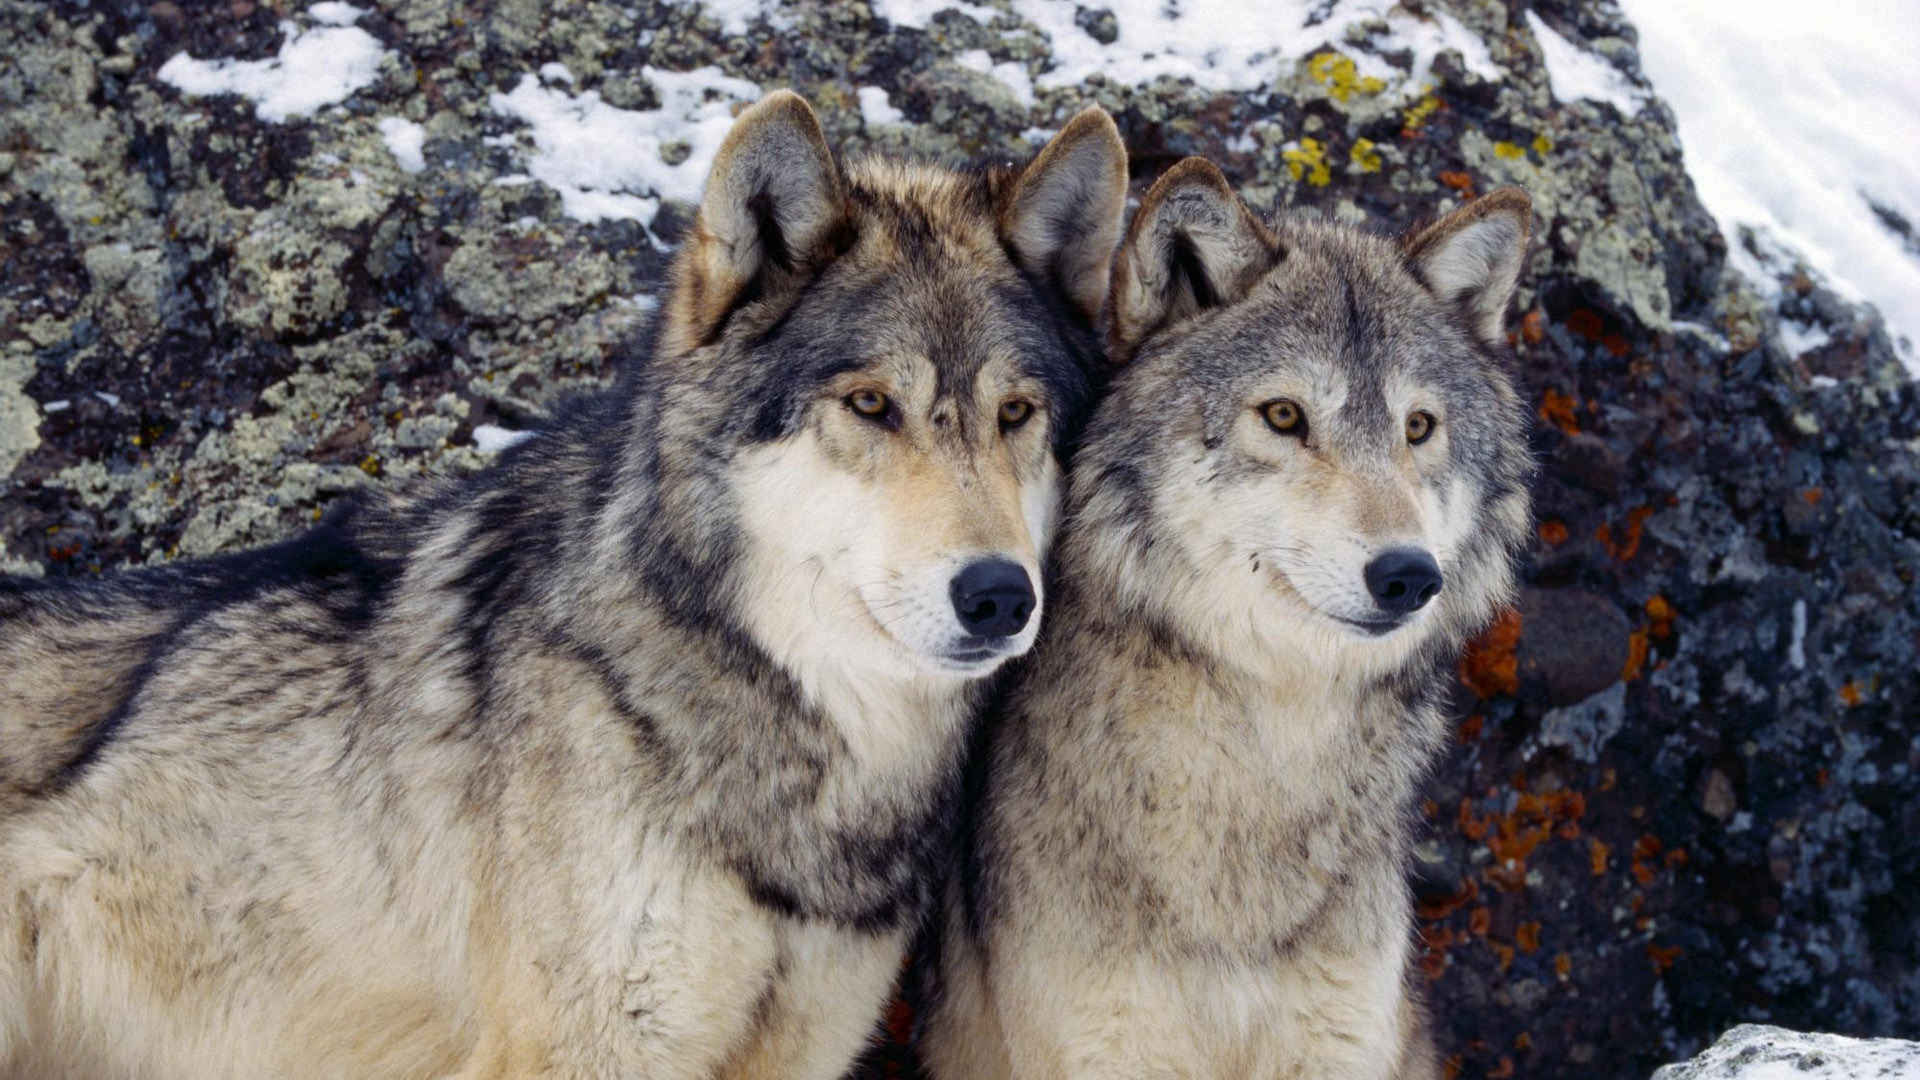 Nevada Wolf Pack Wallpaper: Loup Fond D'écran Hd HD